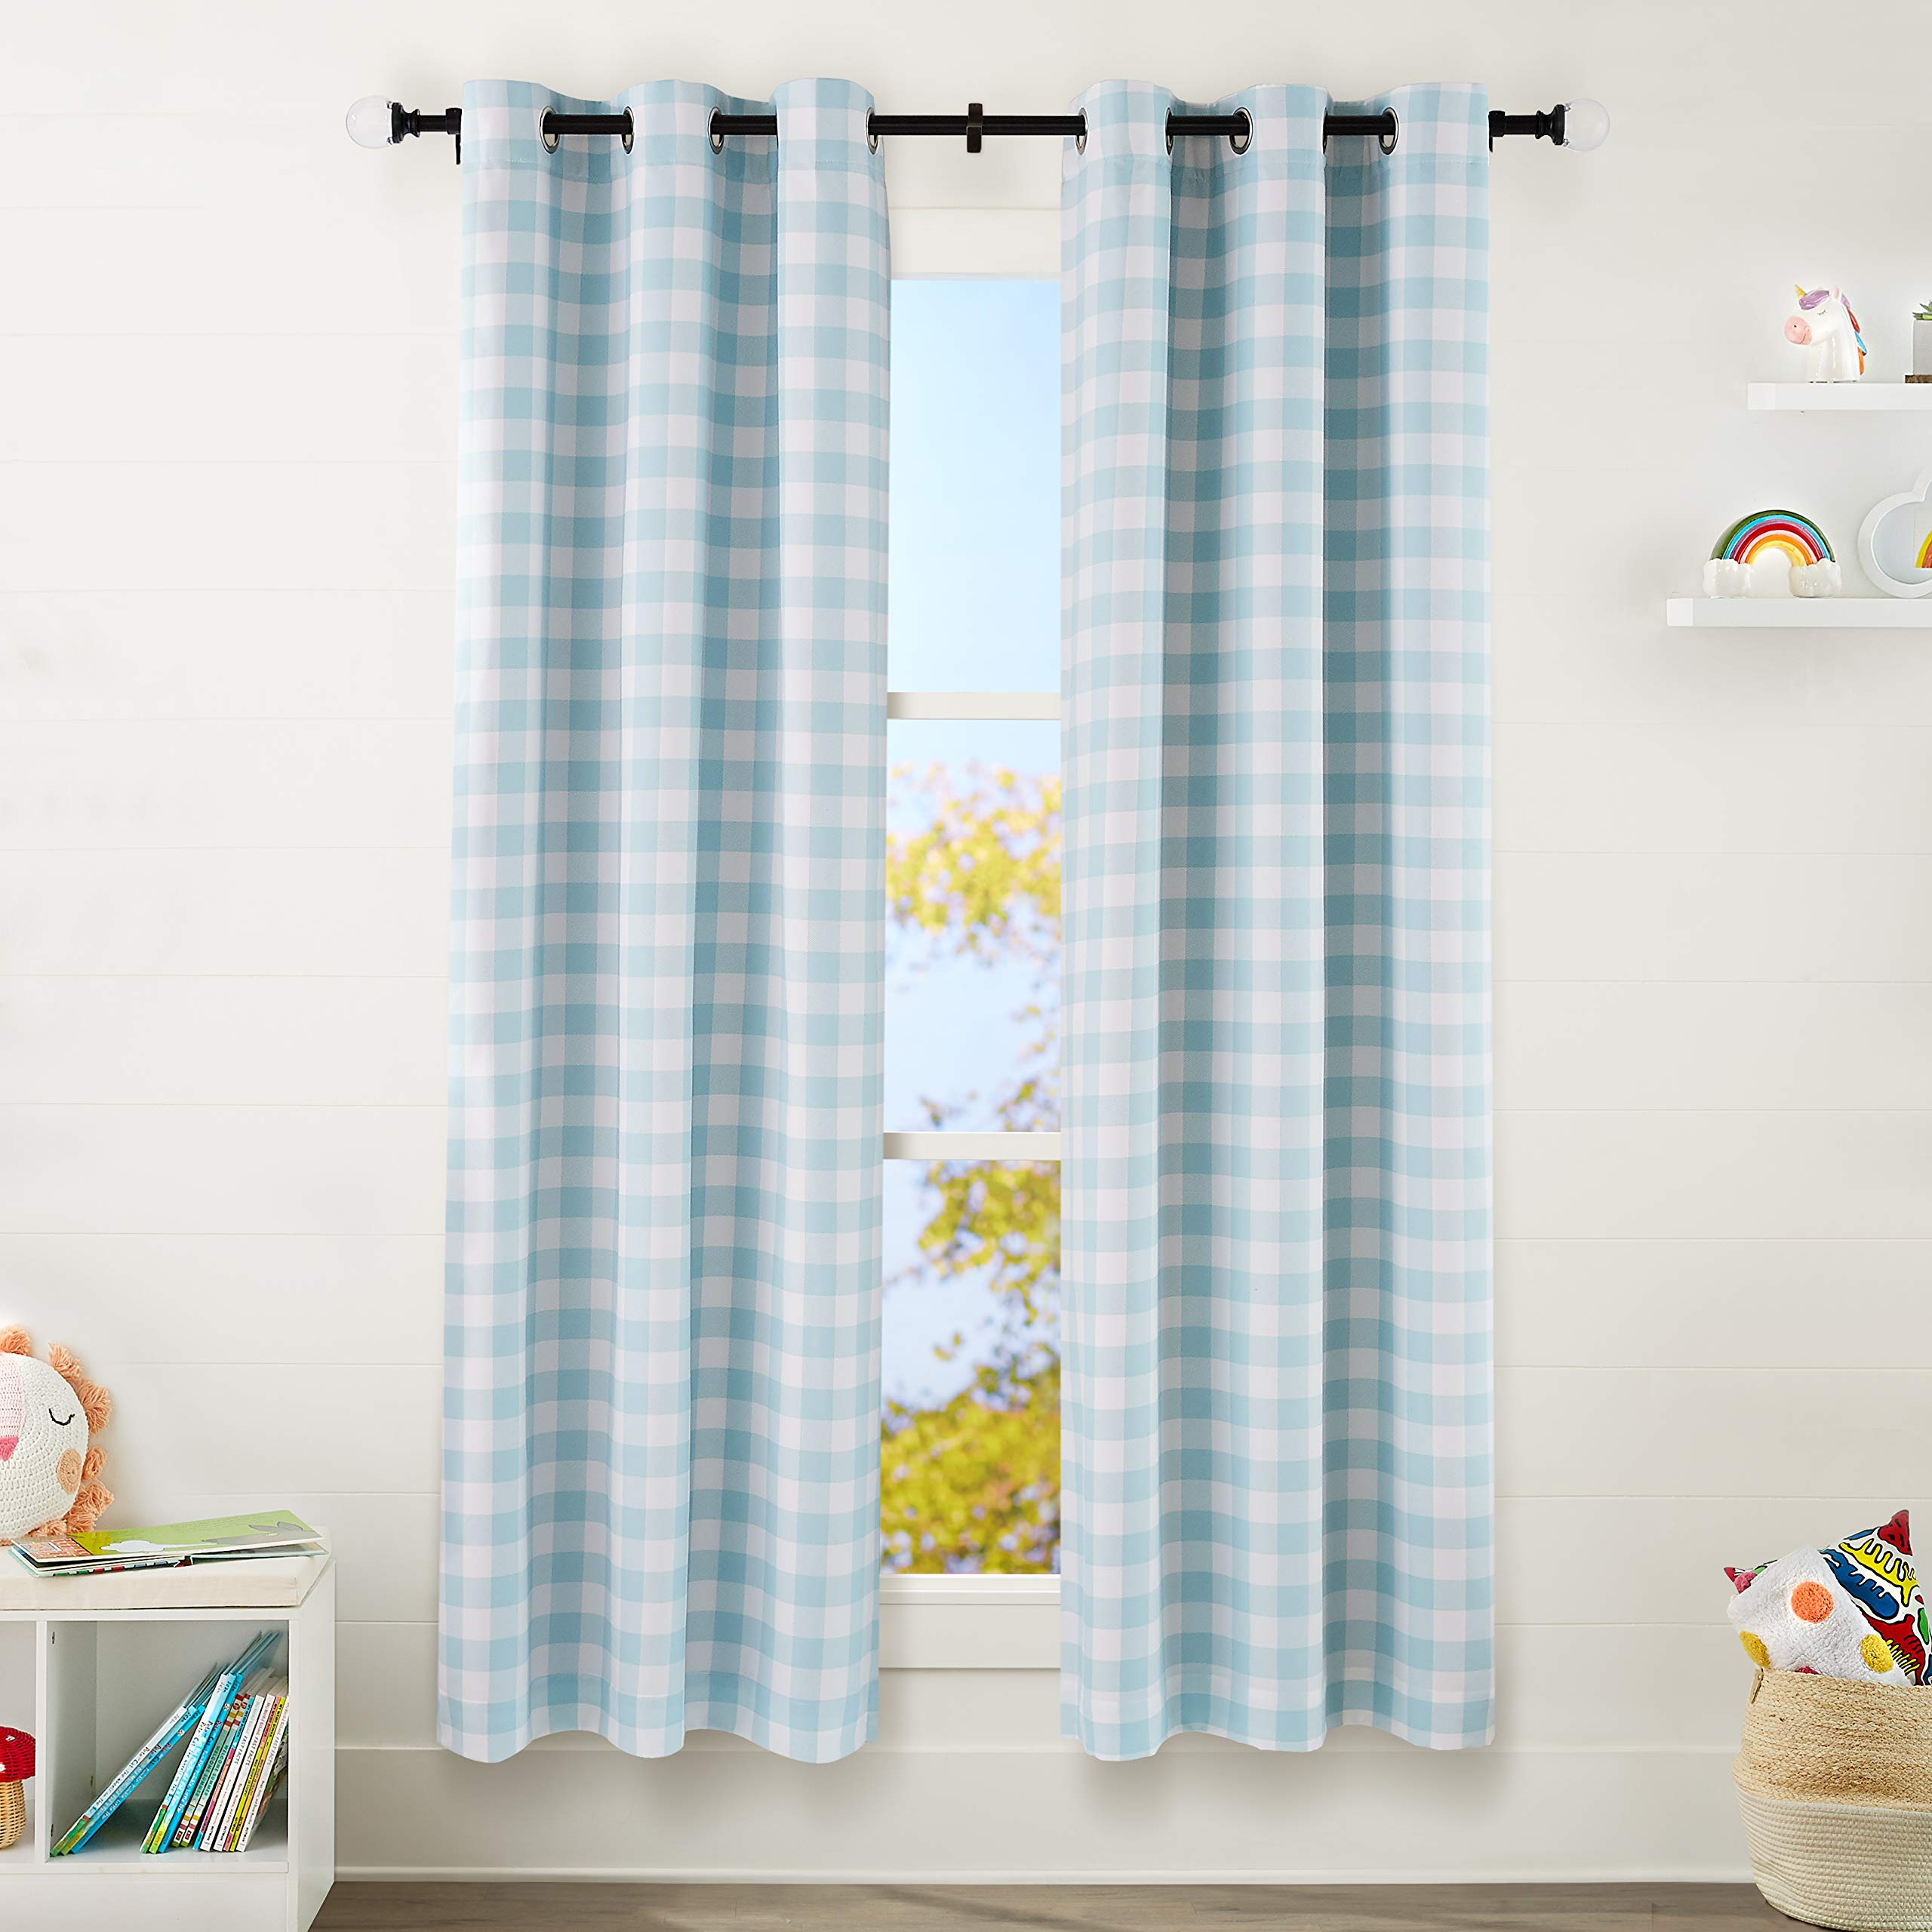 "AmazonBasics Kids Room Darkening Blackout Window Curtain Set with Grommets - 42"" x 84"", Grey Buffalo Plaid"